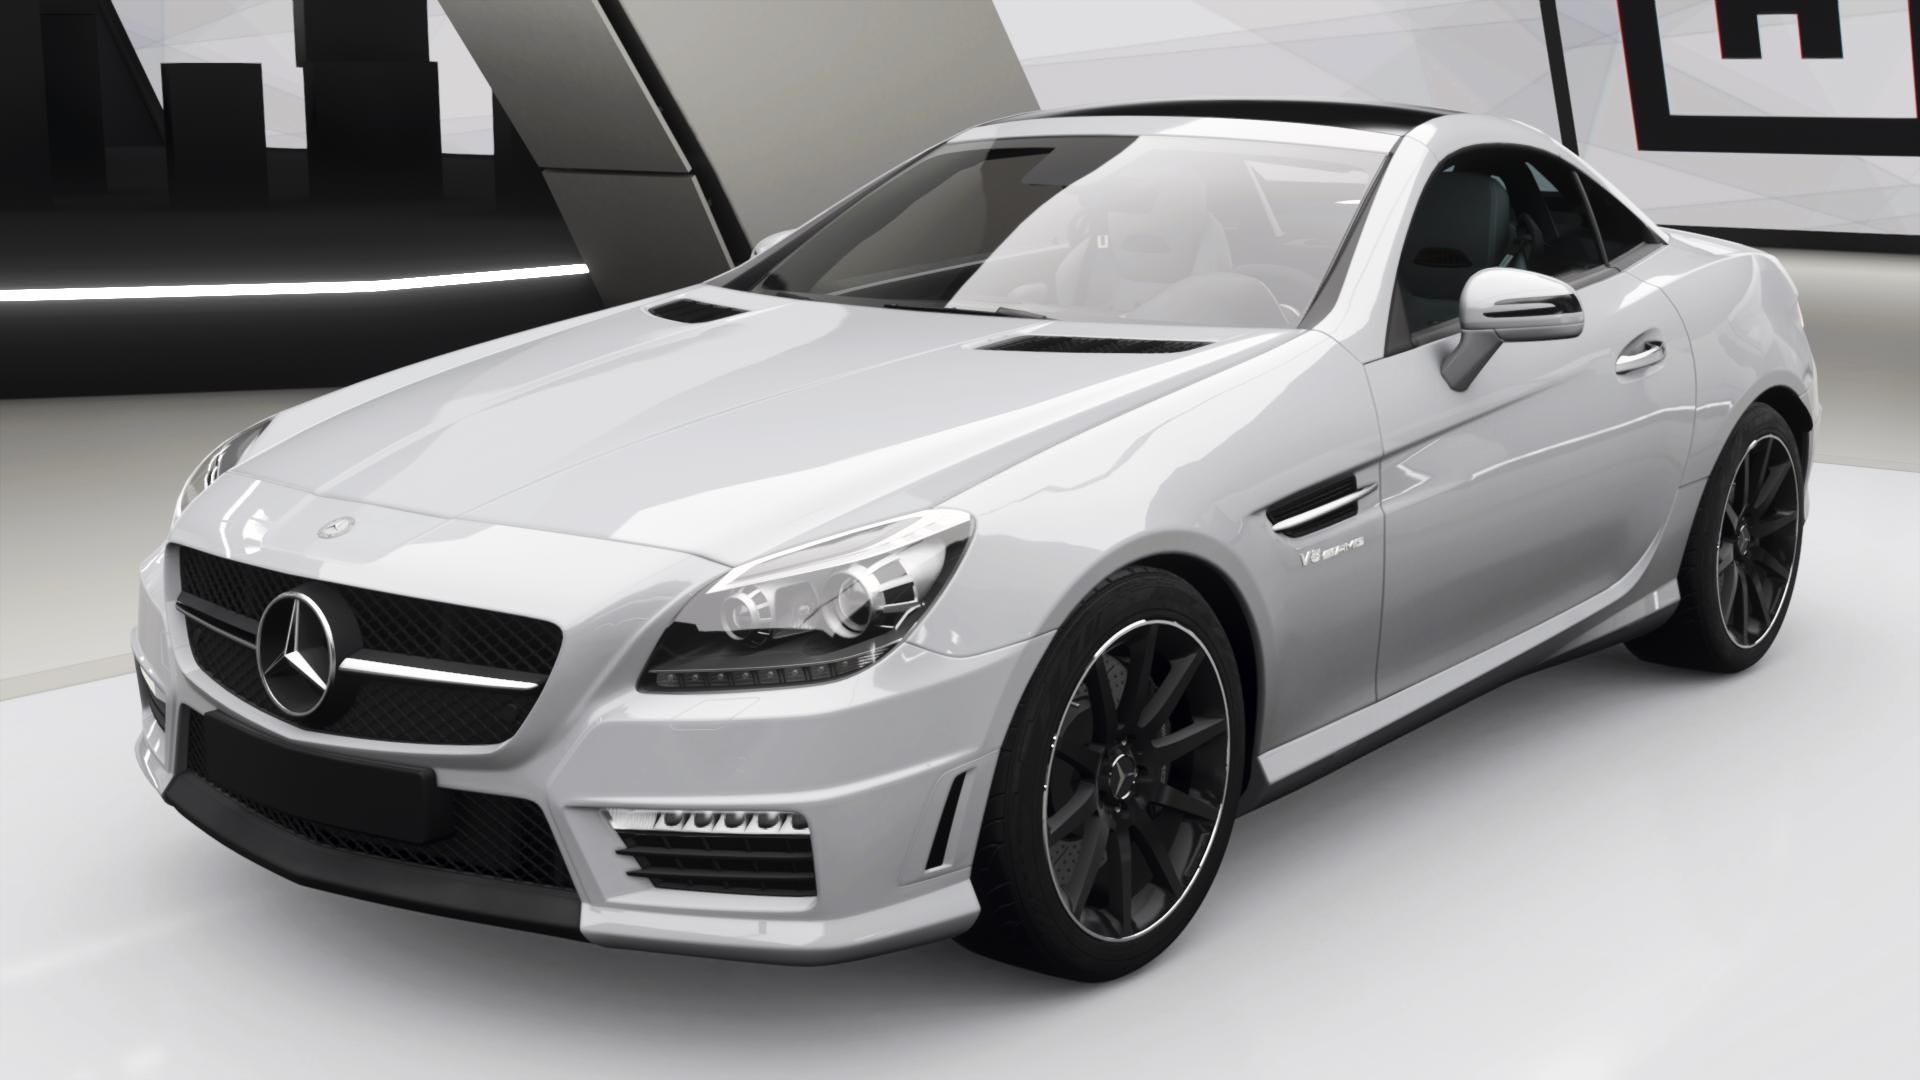 Mercedes-Benz SLK 55 AMG | Forza Motorsport Wiki | FANDOM ...